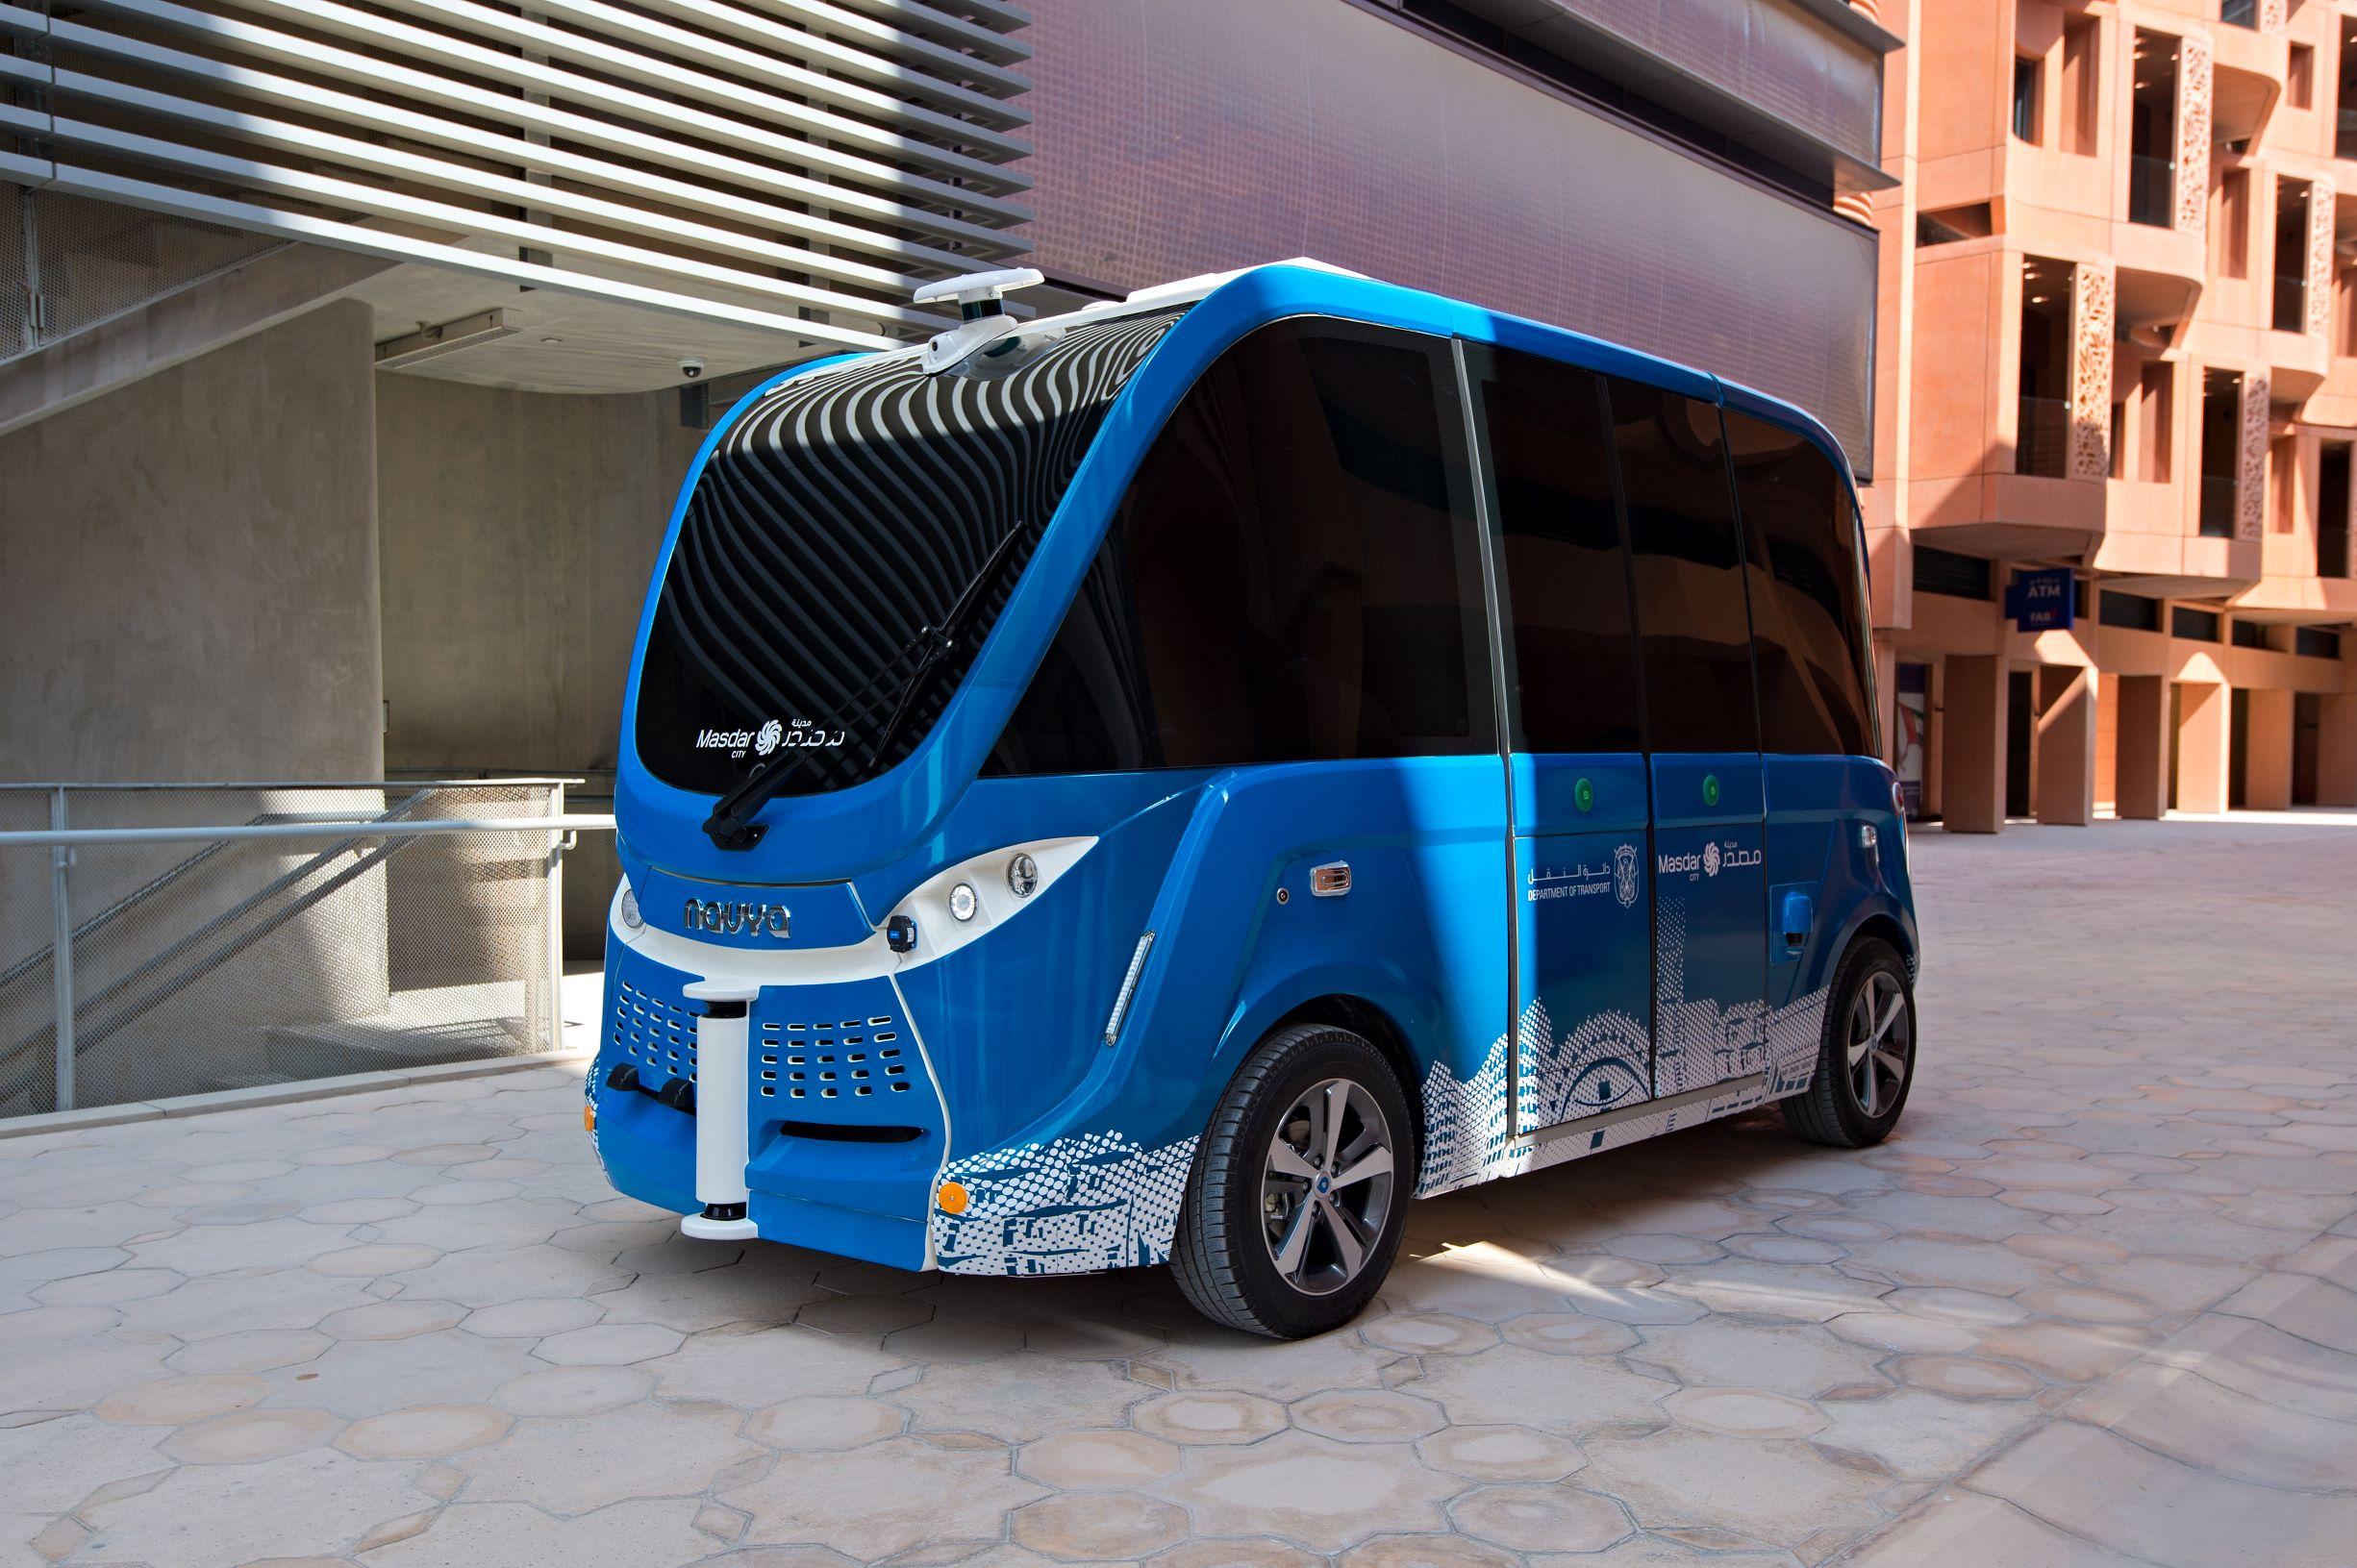 masdar navya- autonomous vehicle launch (2)